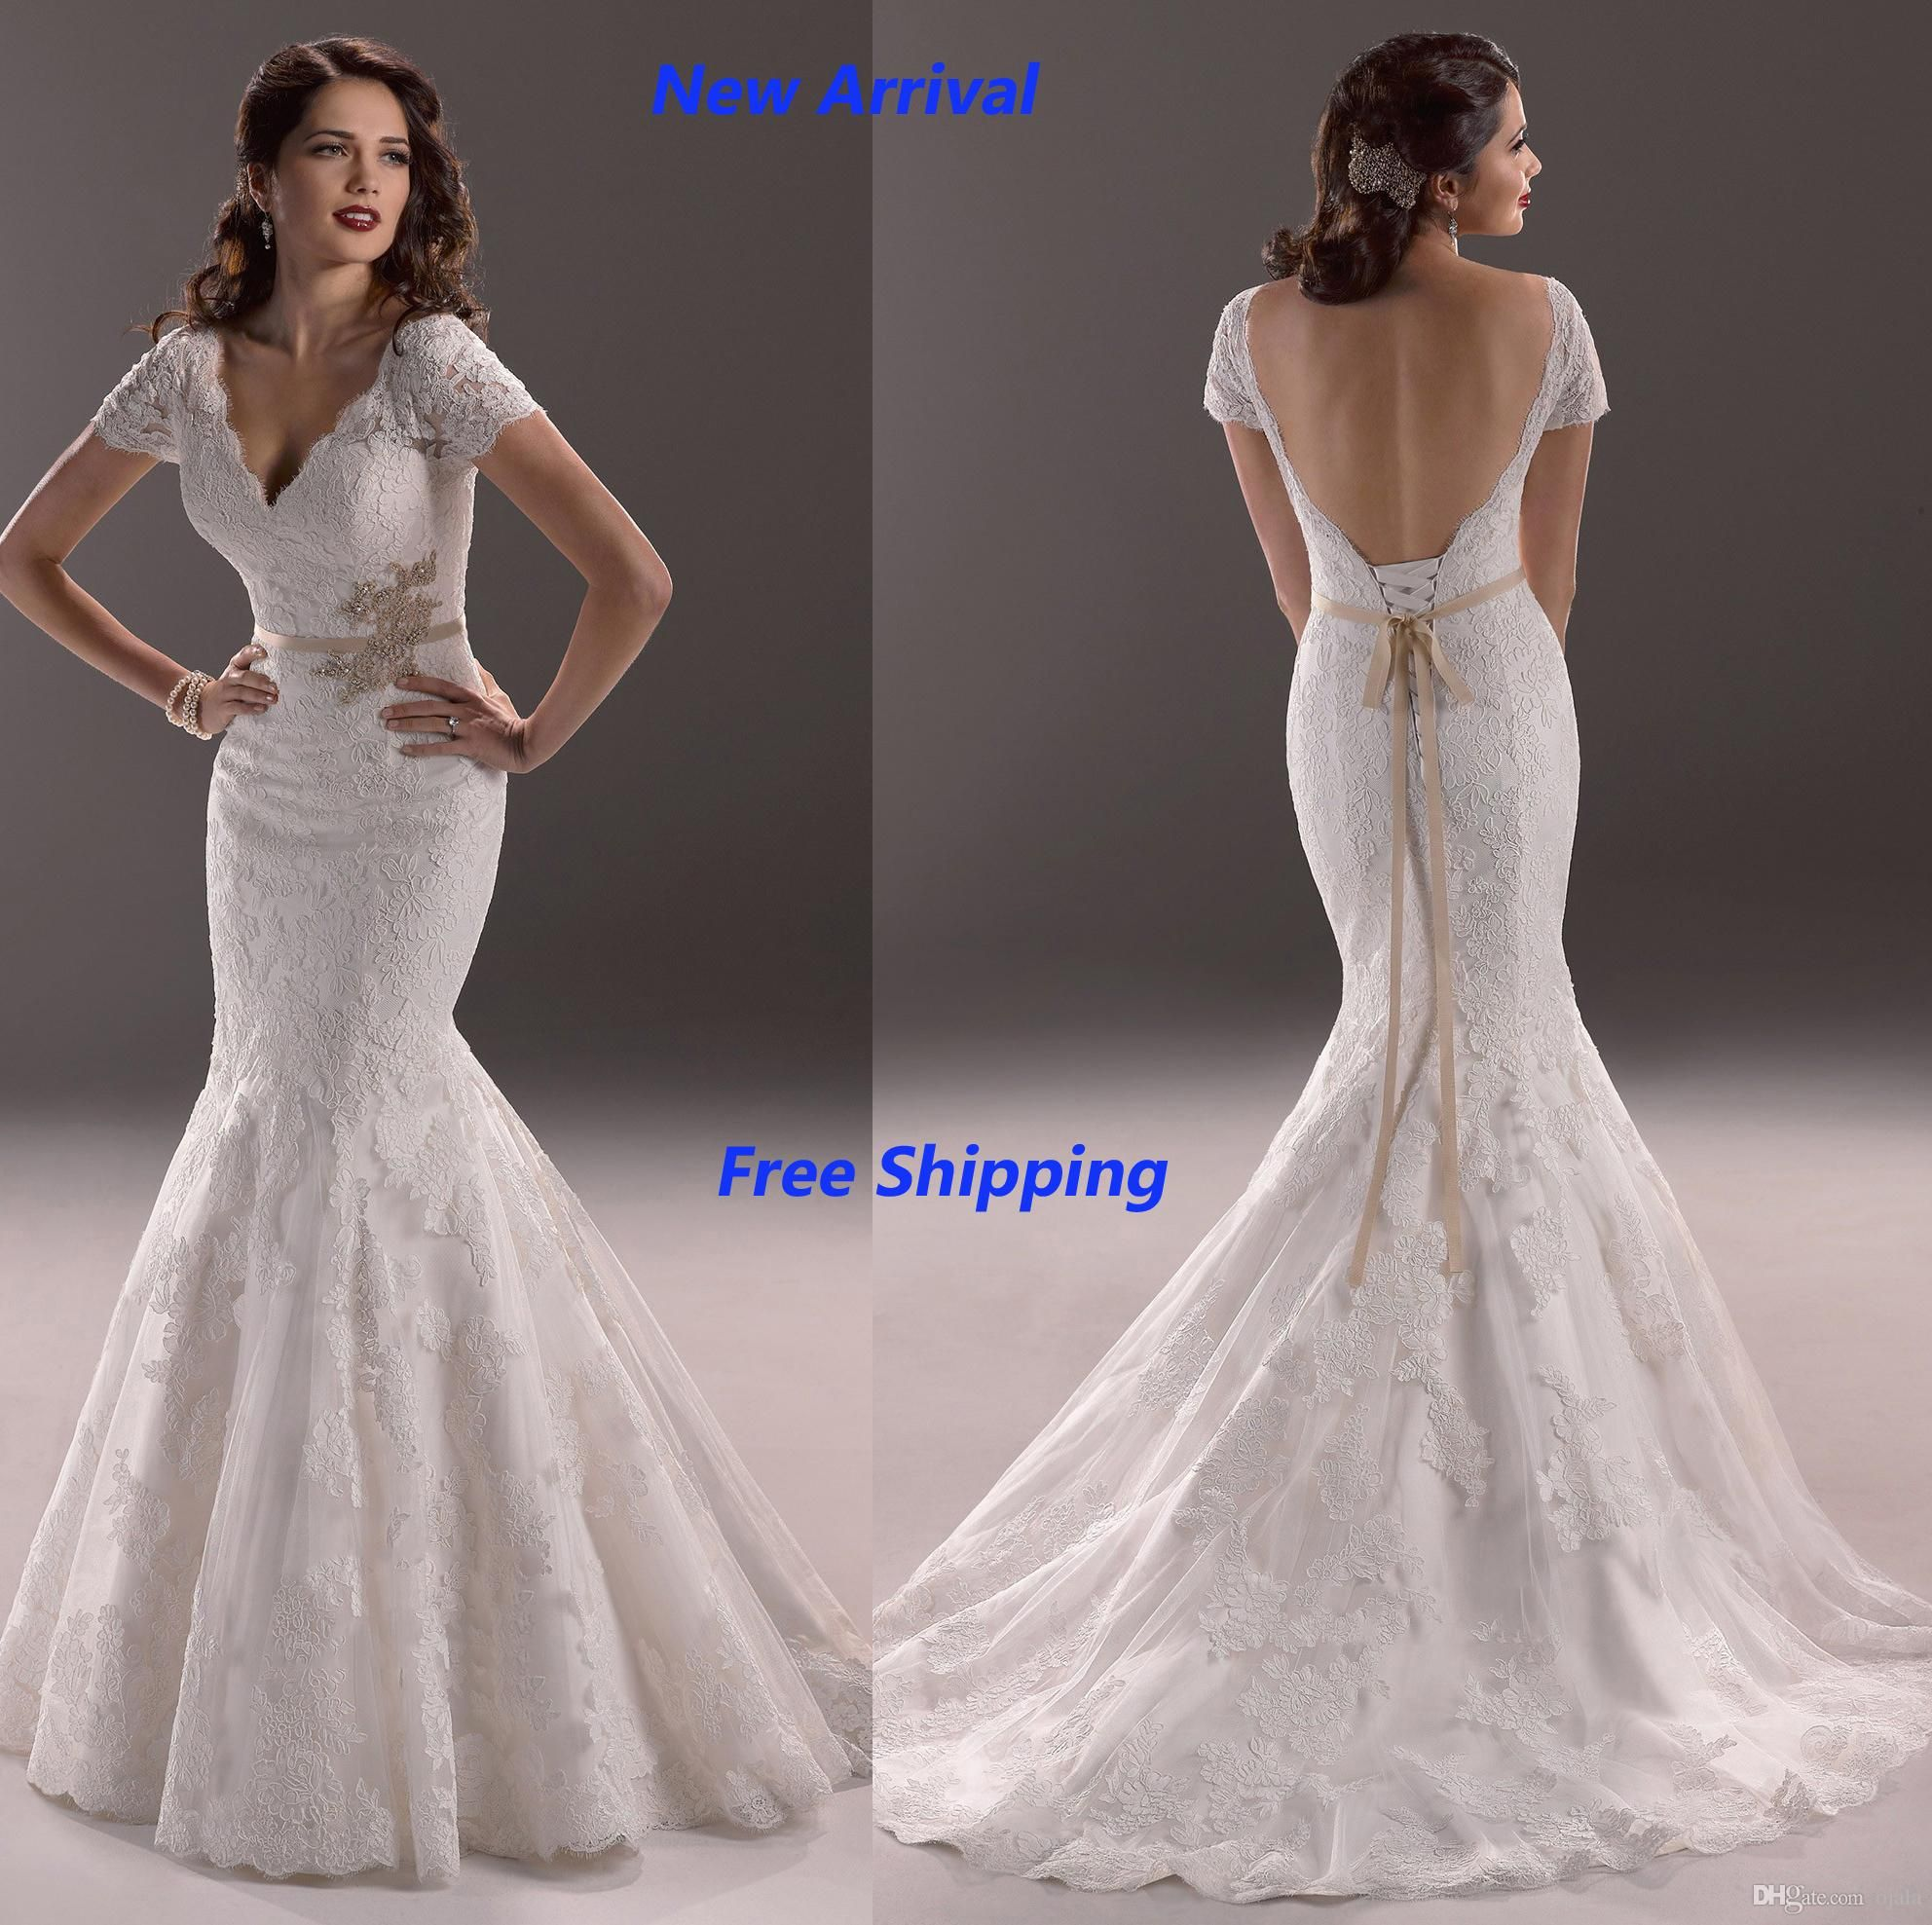 Free Shipping 100 53 Piece Whole W59 Short Sleeve Fish Tail Fashionable Plus Backless Mermaid Wedding Dressesdress